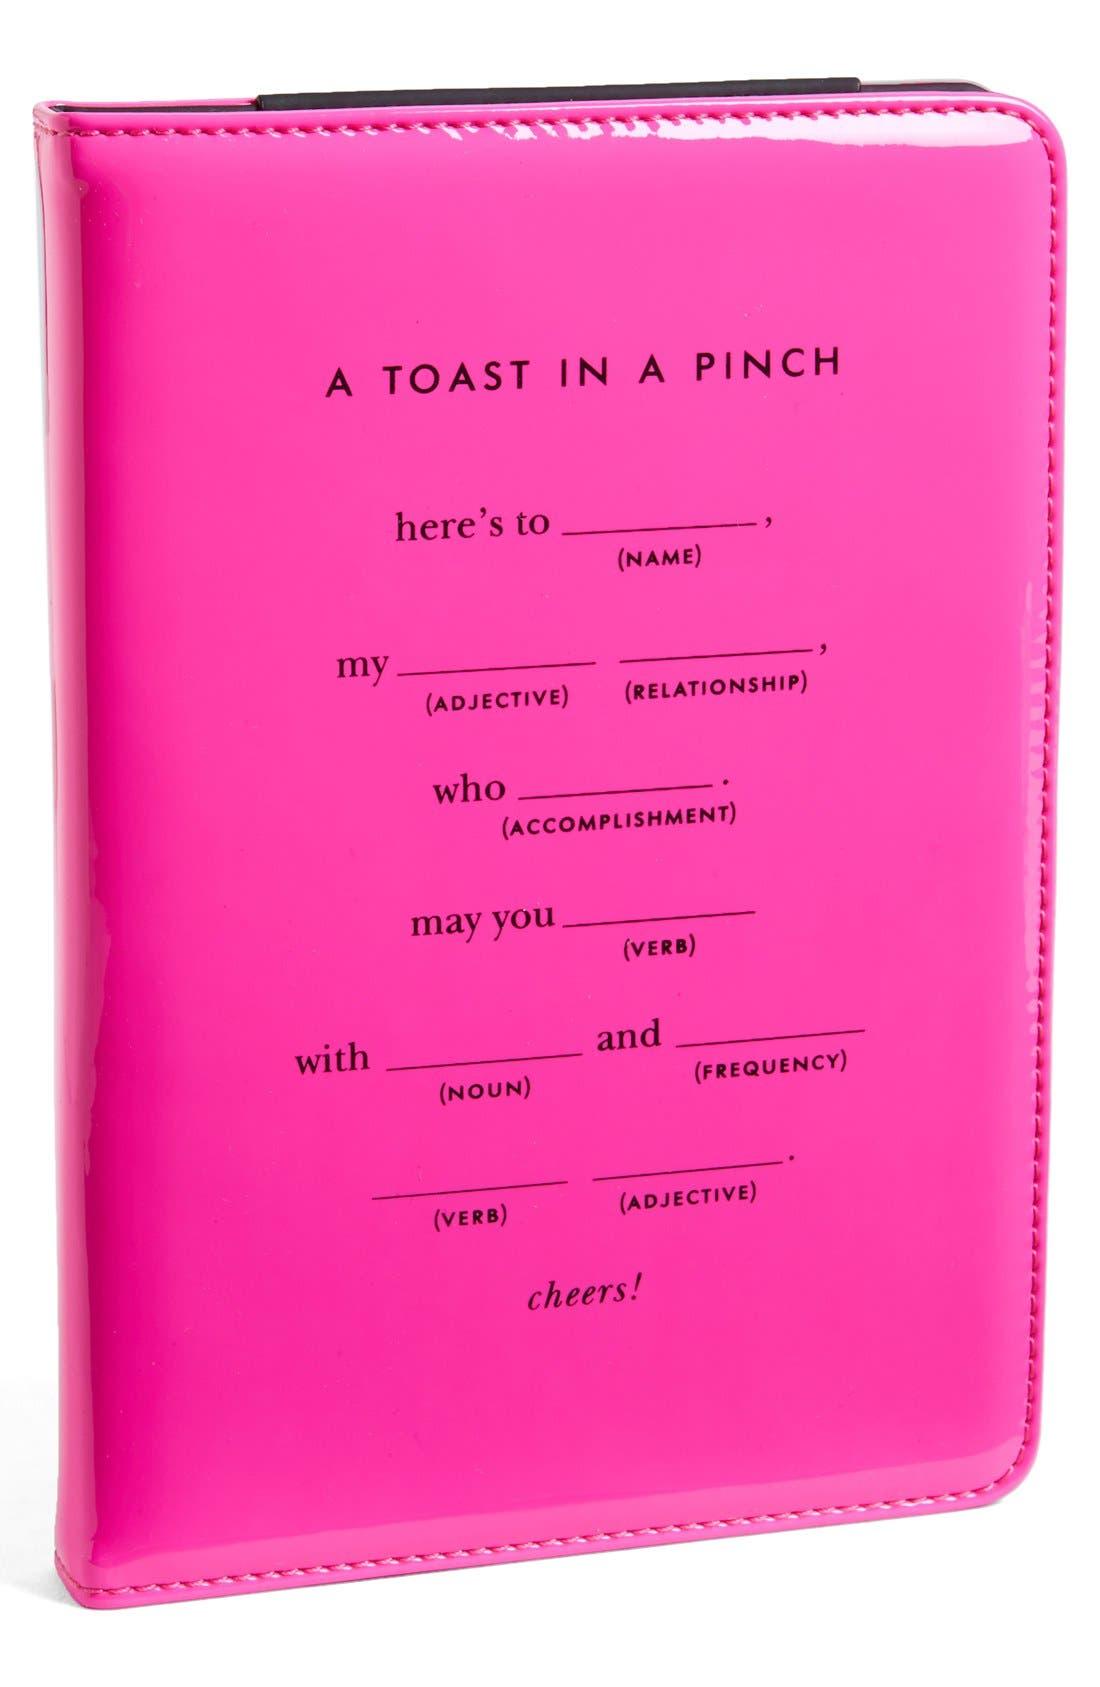 Alternate Image 1 Selected - kate spade new york 'toast in a pinch' iPad mini folio